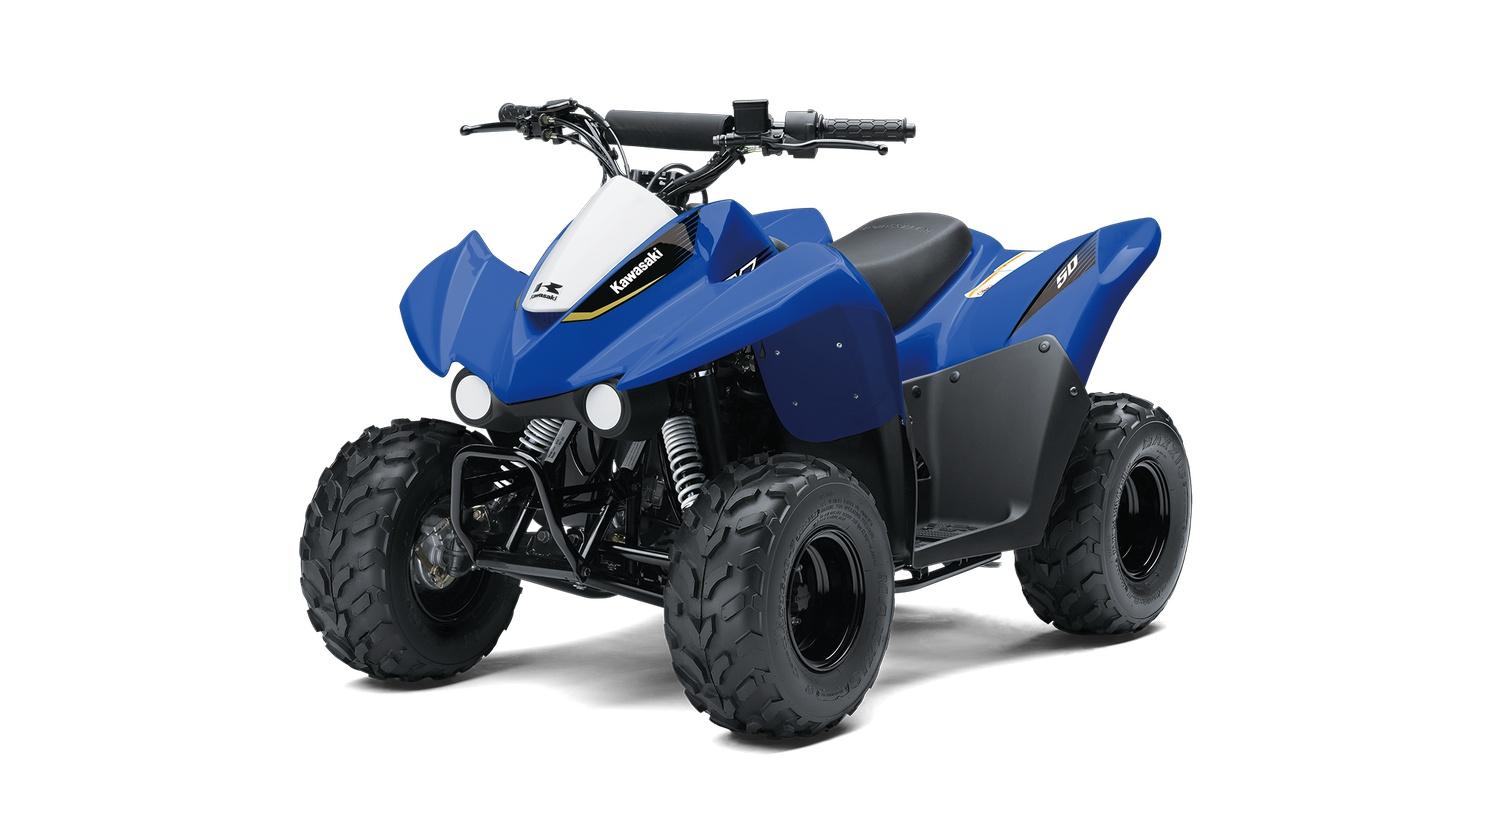 Kawasaki KFX50 Bleu Vibrant 2020